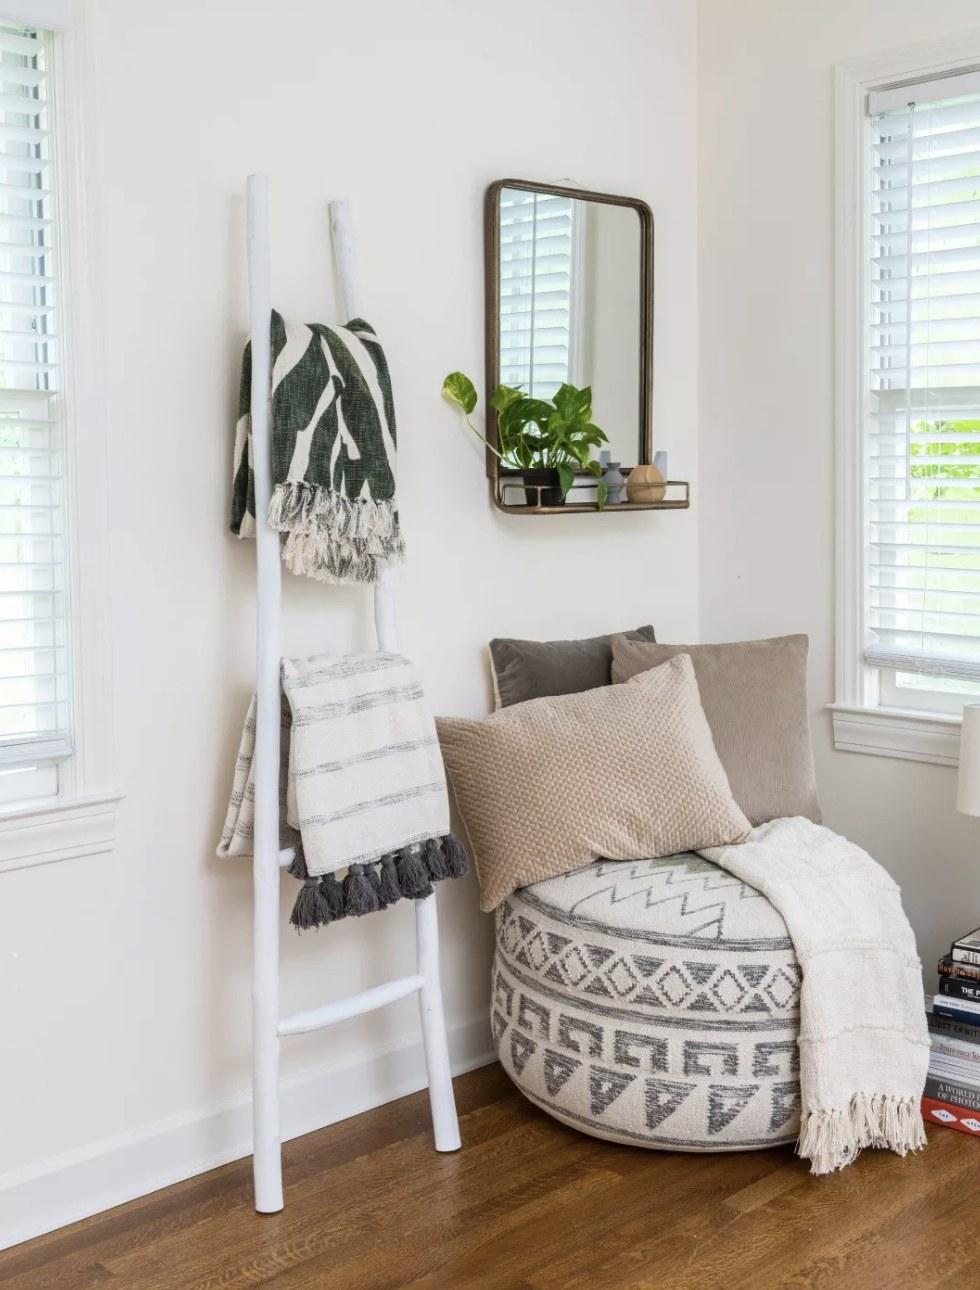 Ladder holding blankets in living room